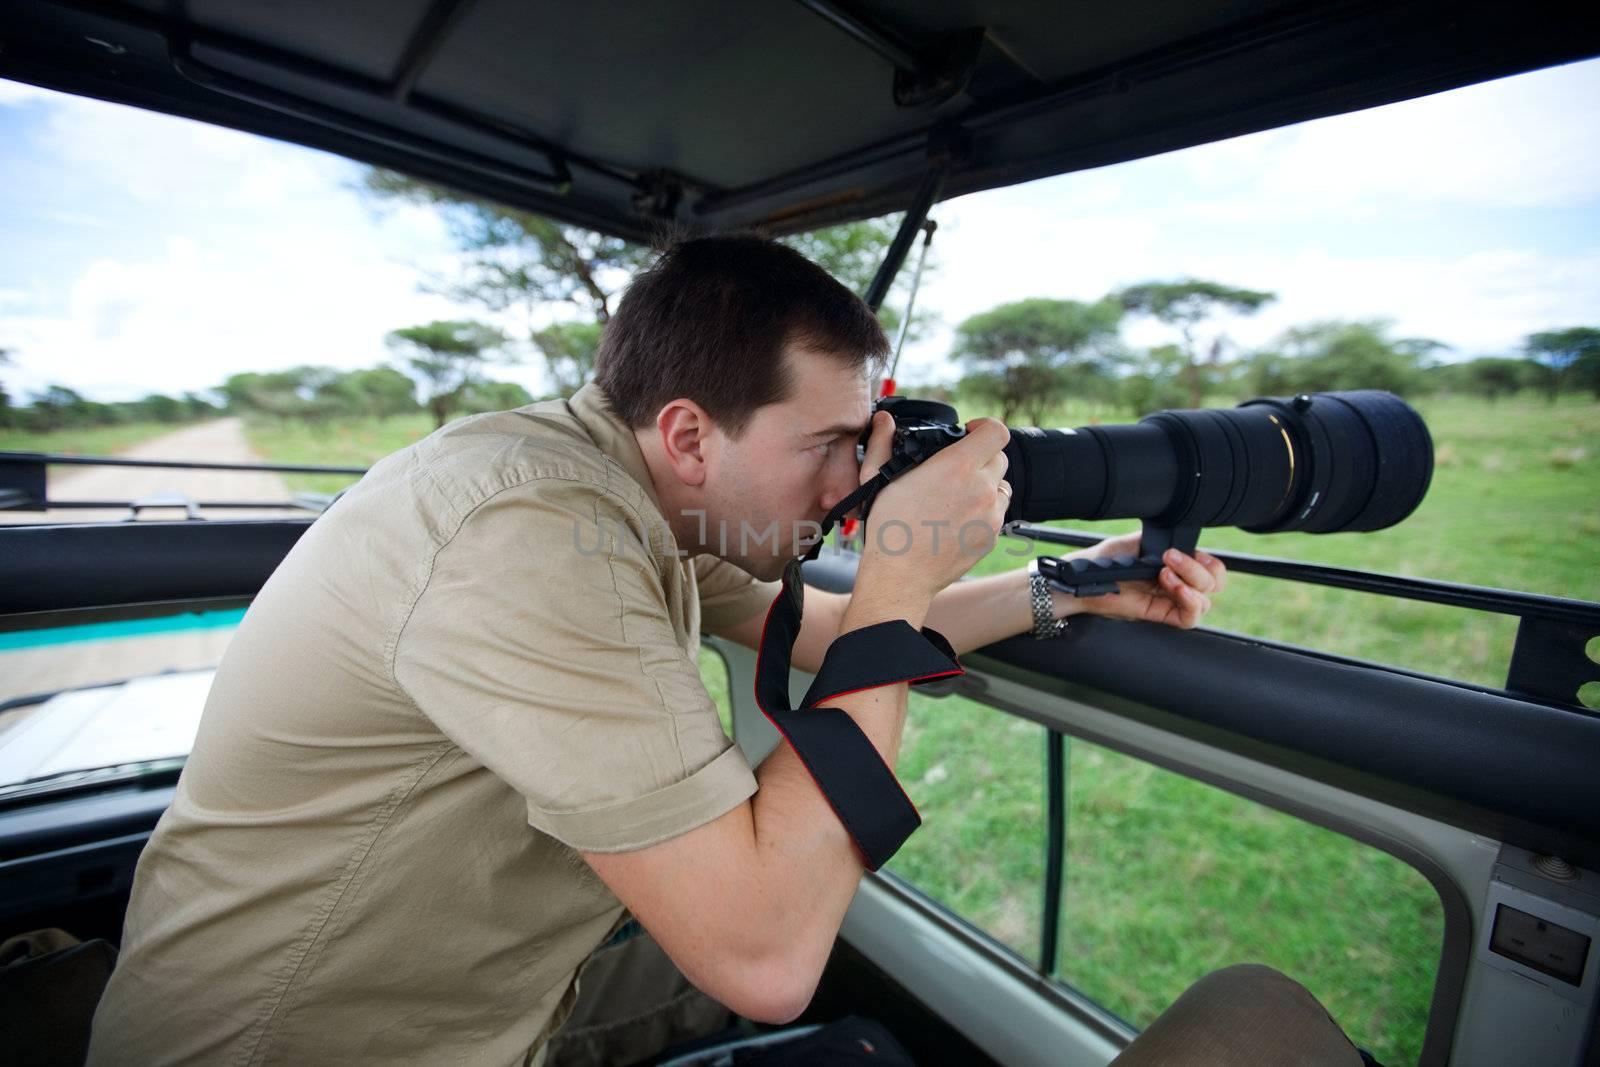 Safari vacation. Professional photographer taking picture on game drive in Tarangire national park, Tanzania.